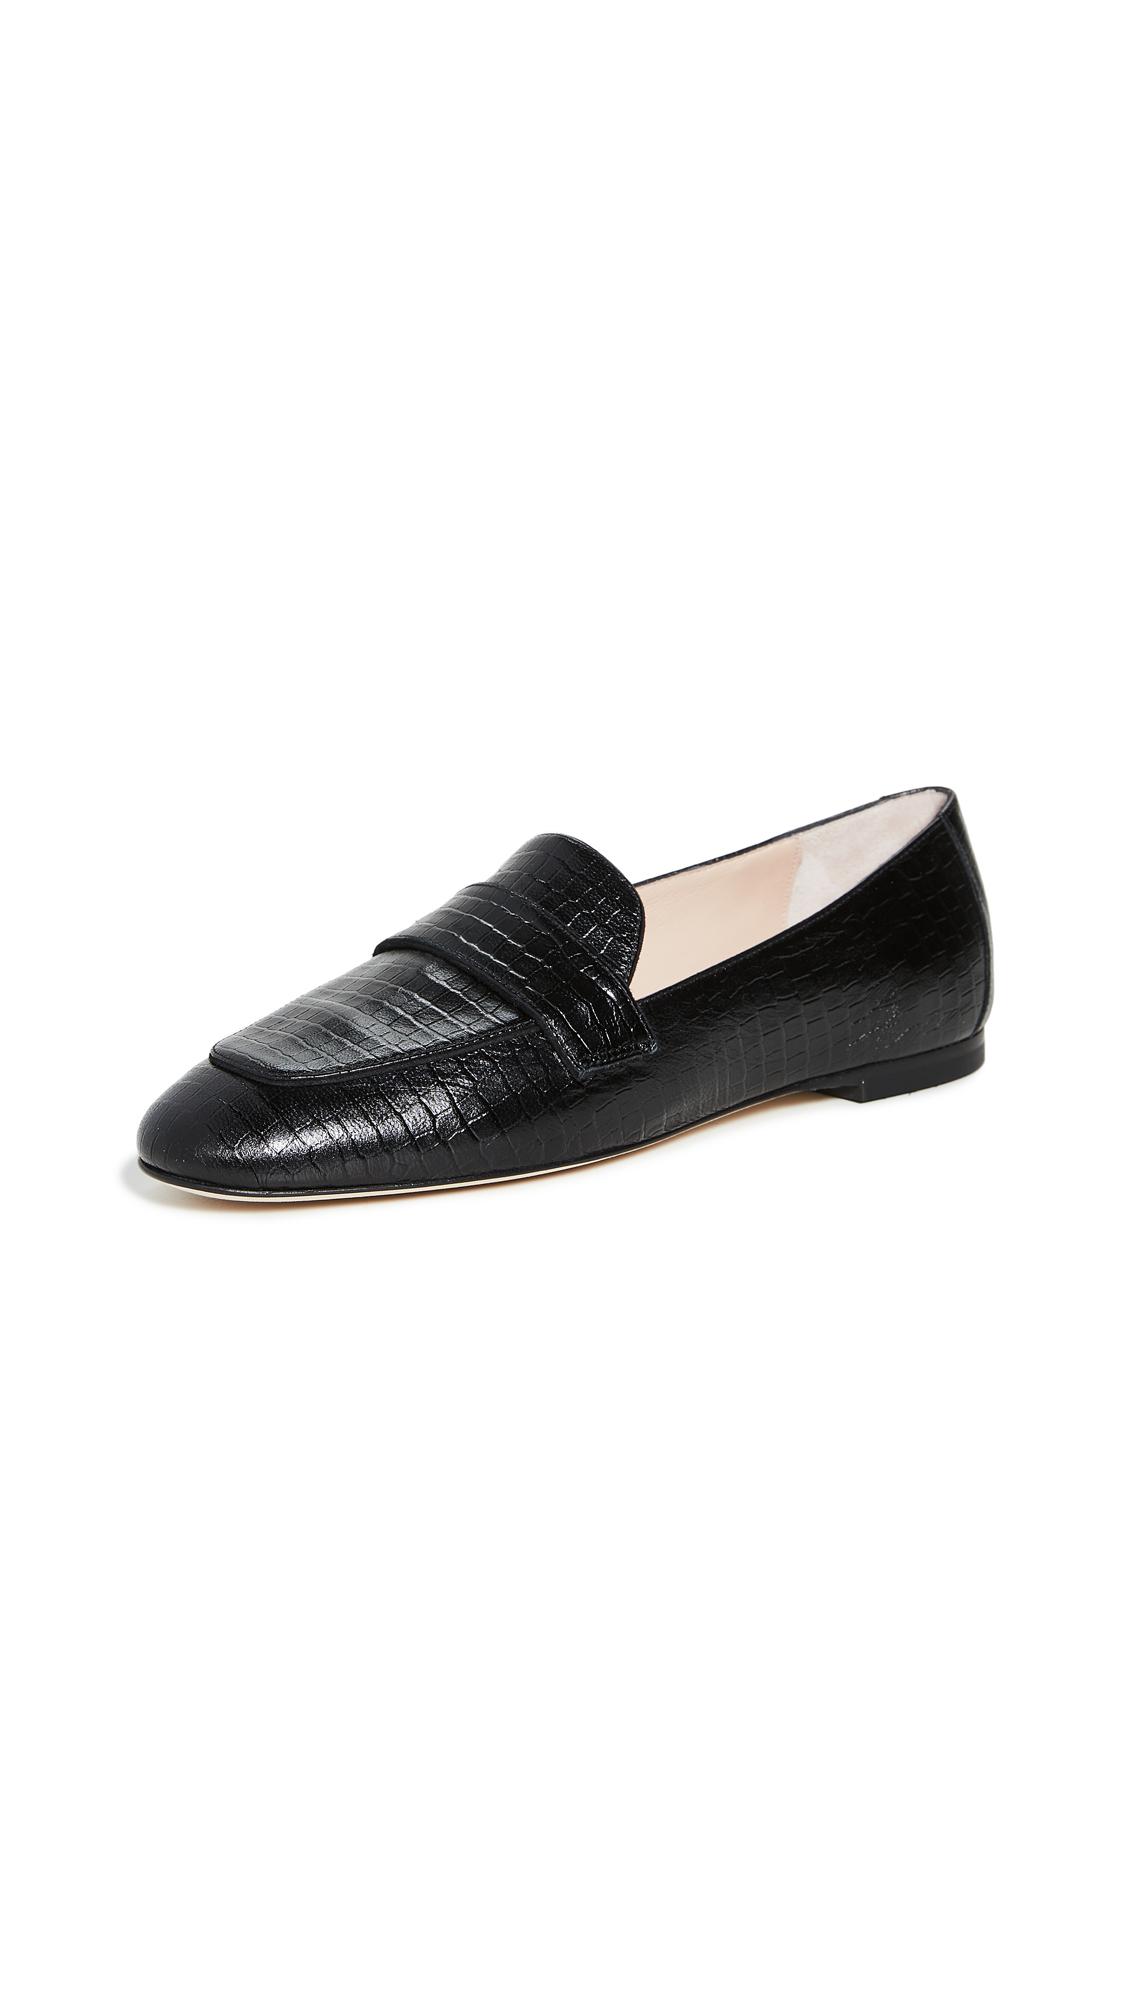 Stuart Weitzman Payson Loafers – 30% Off Sale